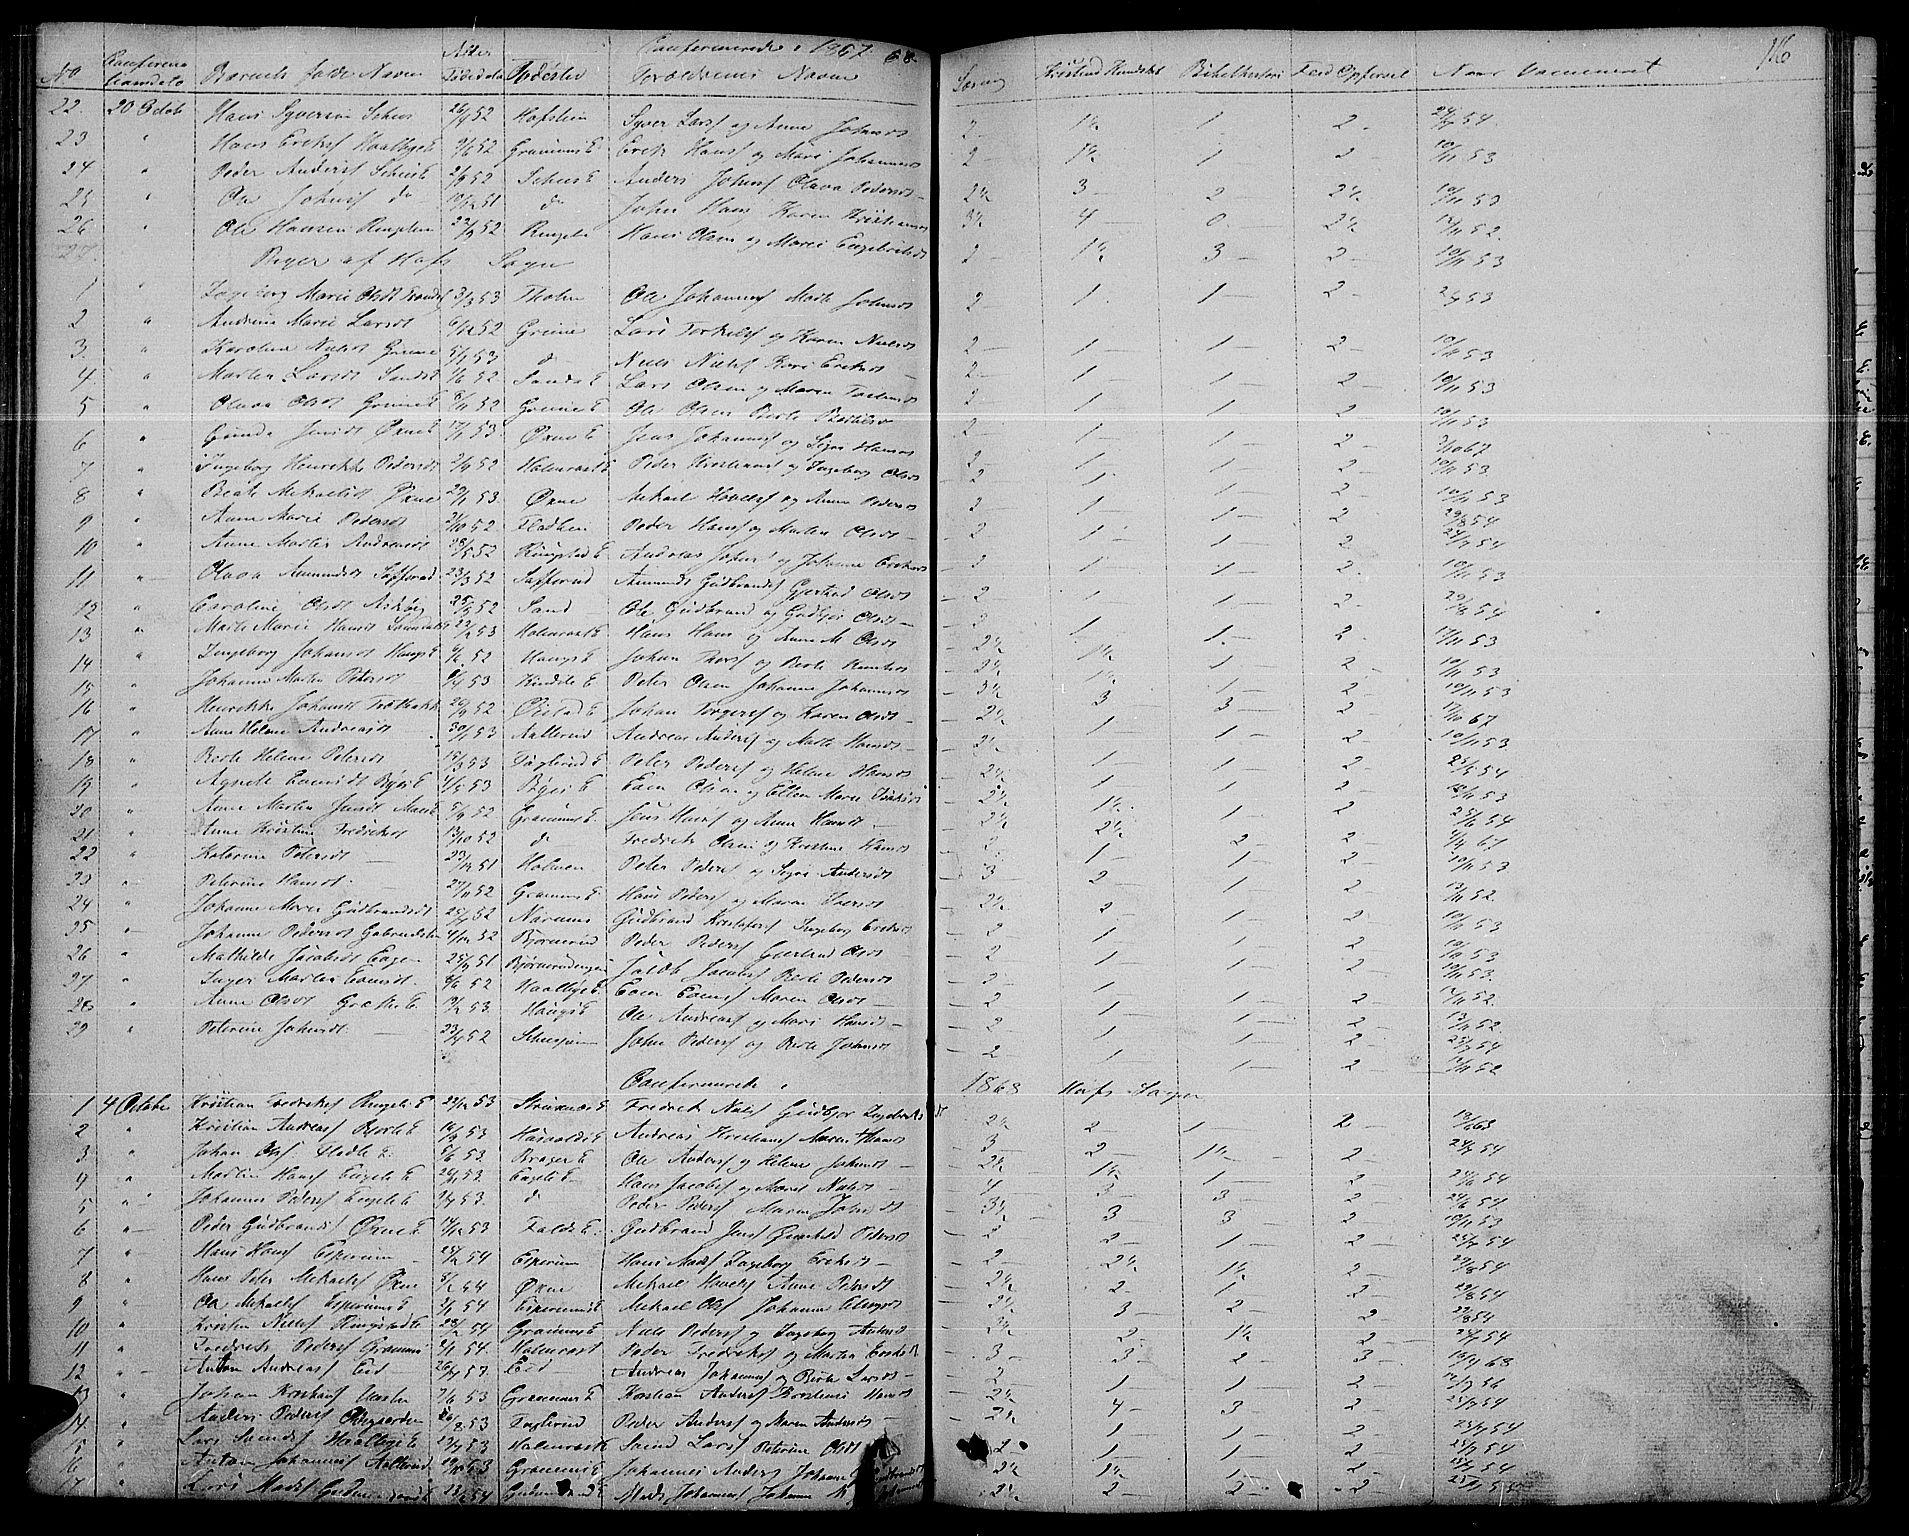 SAH, Søndre Land prestekontor, L/L0001: Klokkerbok nr. 1, 1849-1883, s. 116